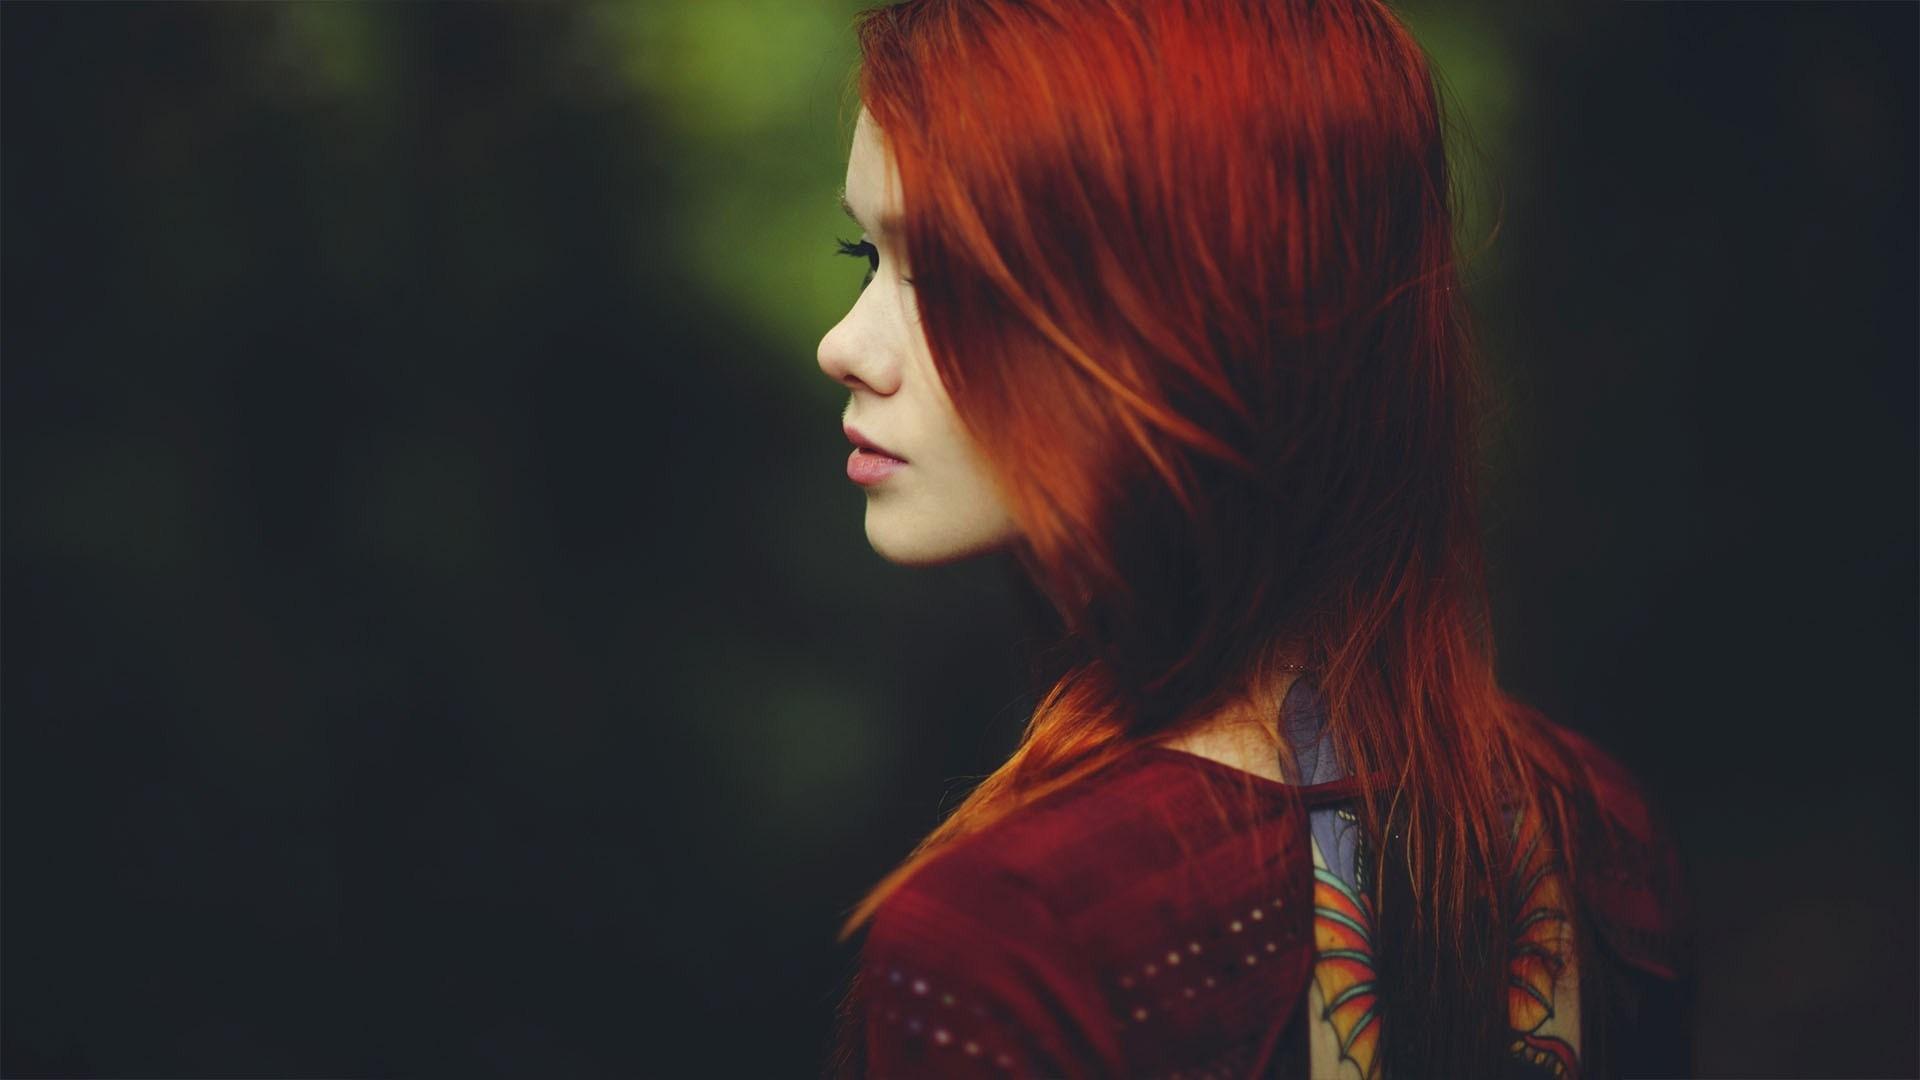 Beauty Redhead Girl Model Fashion Tattoo Photo